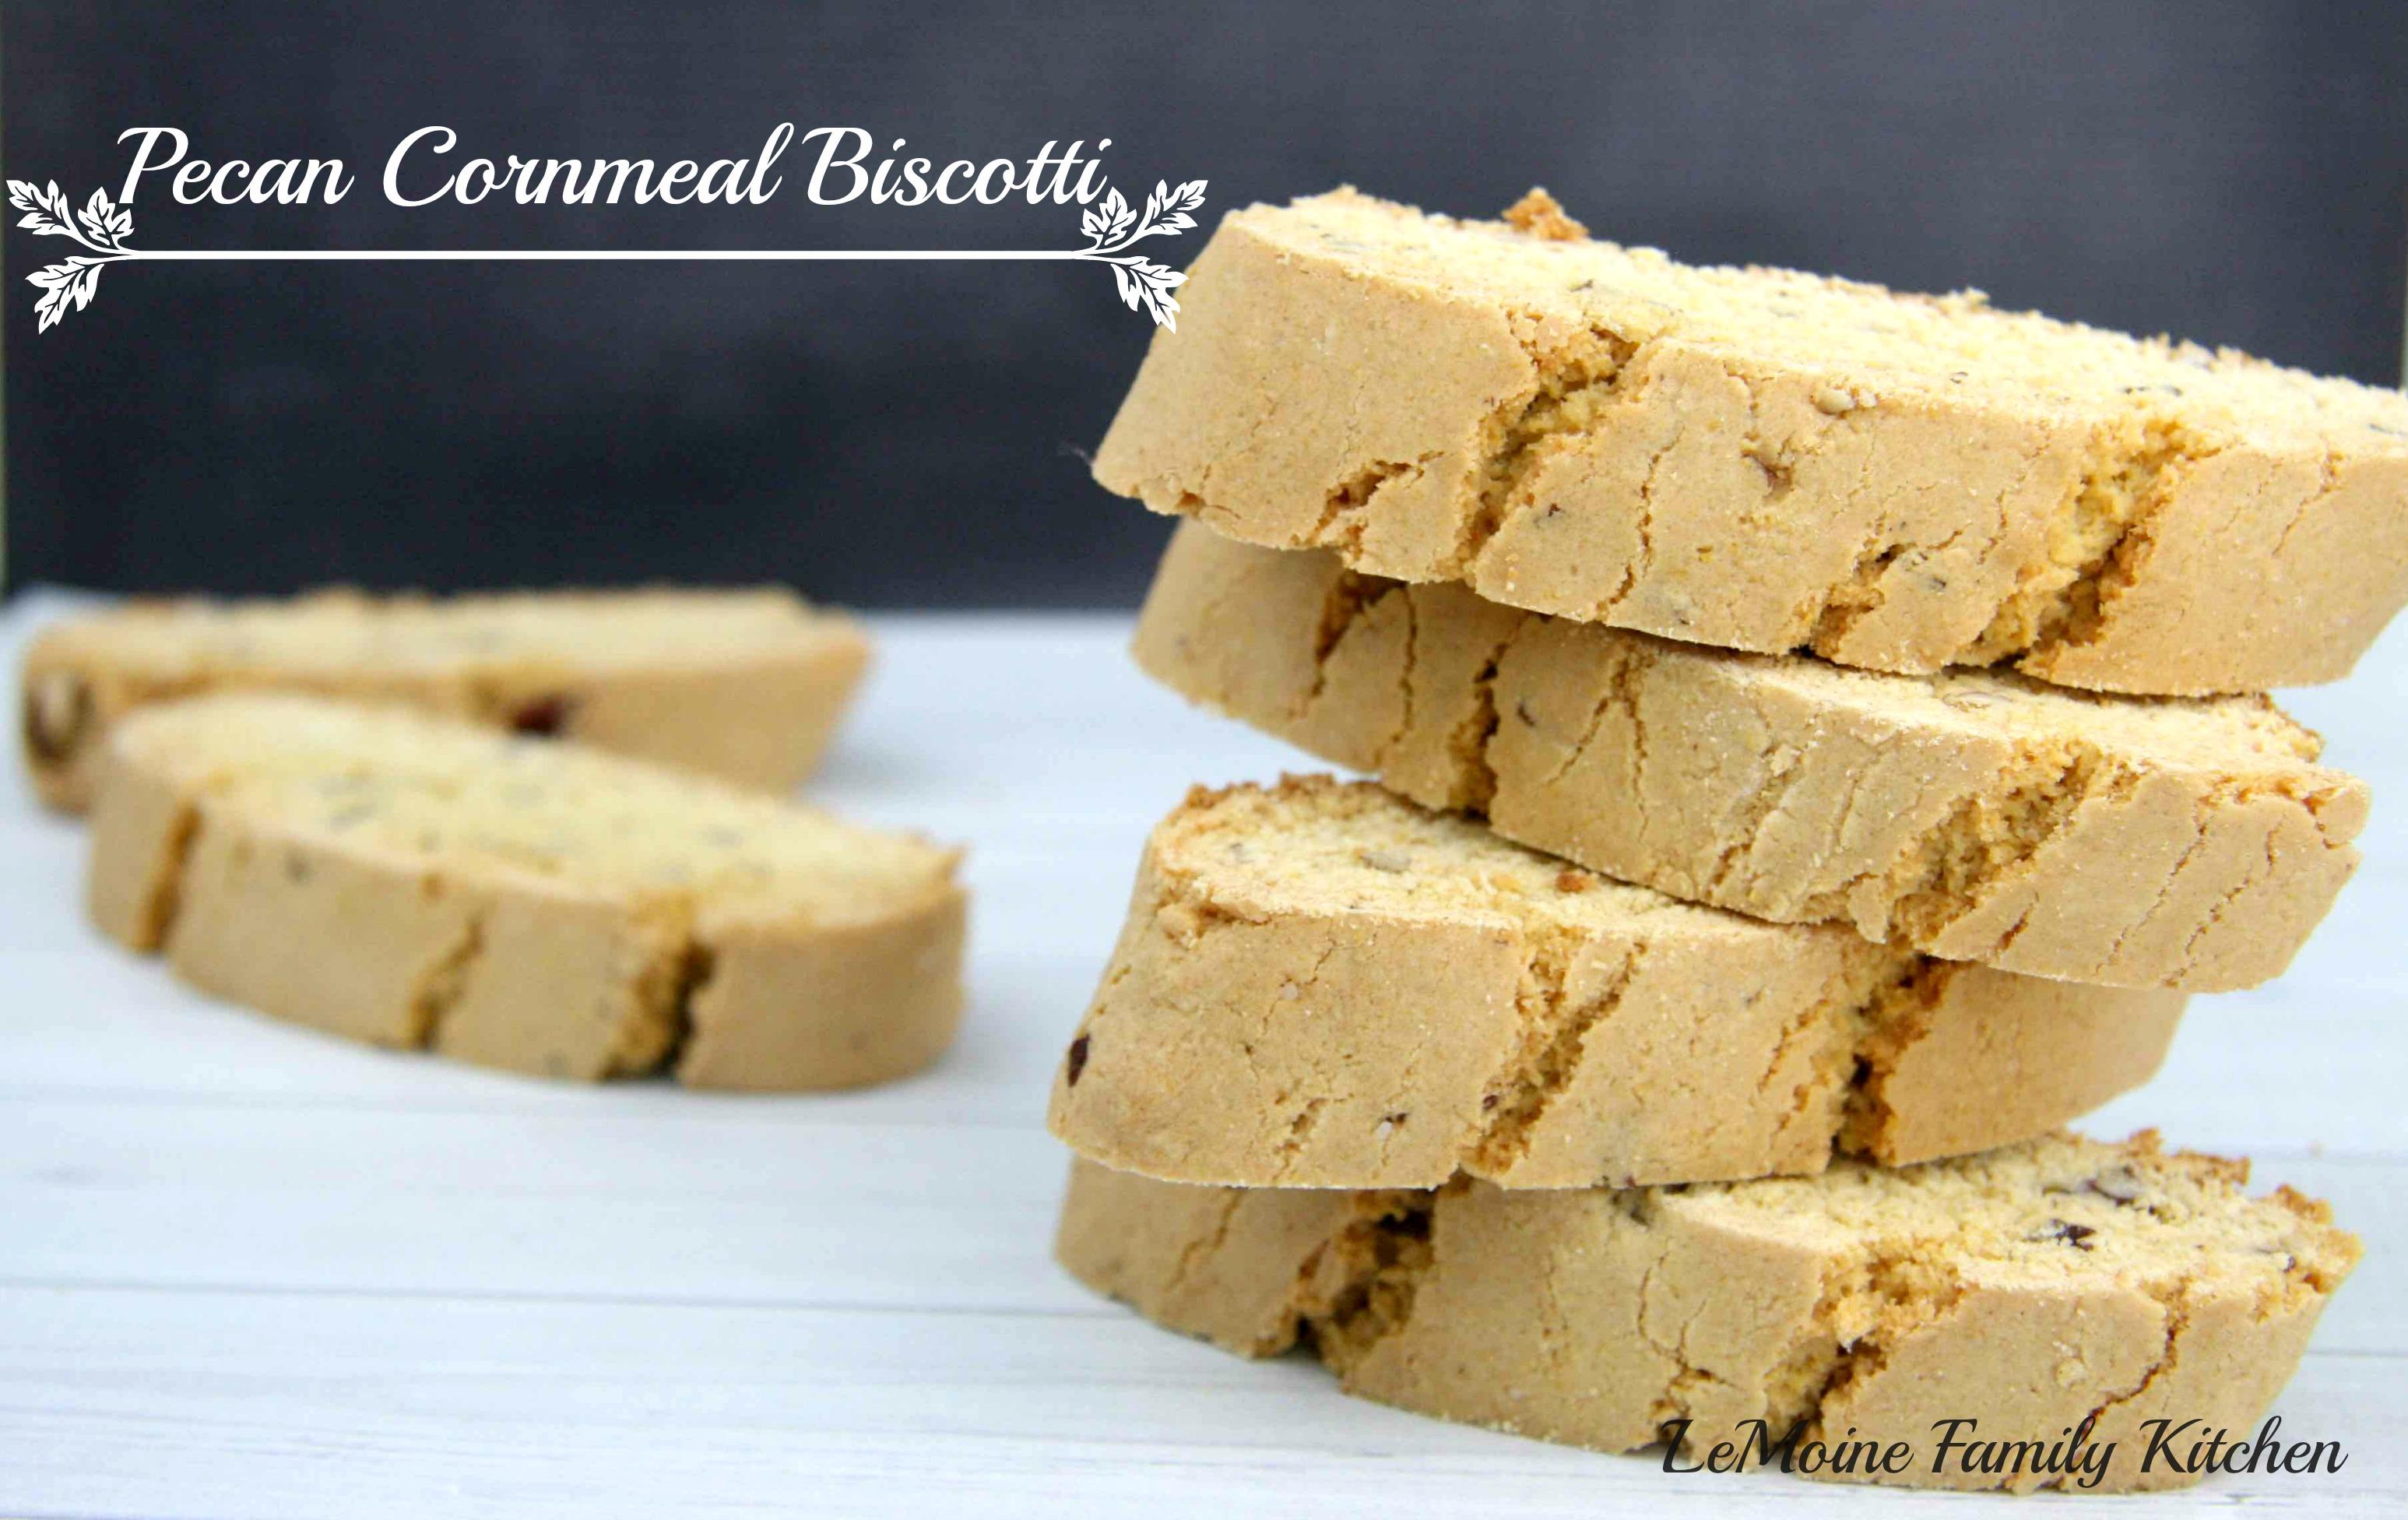 Pecan Cornmeal Biscotti - LeMoine Family Kitchen